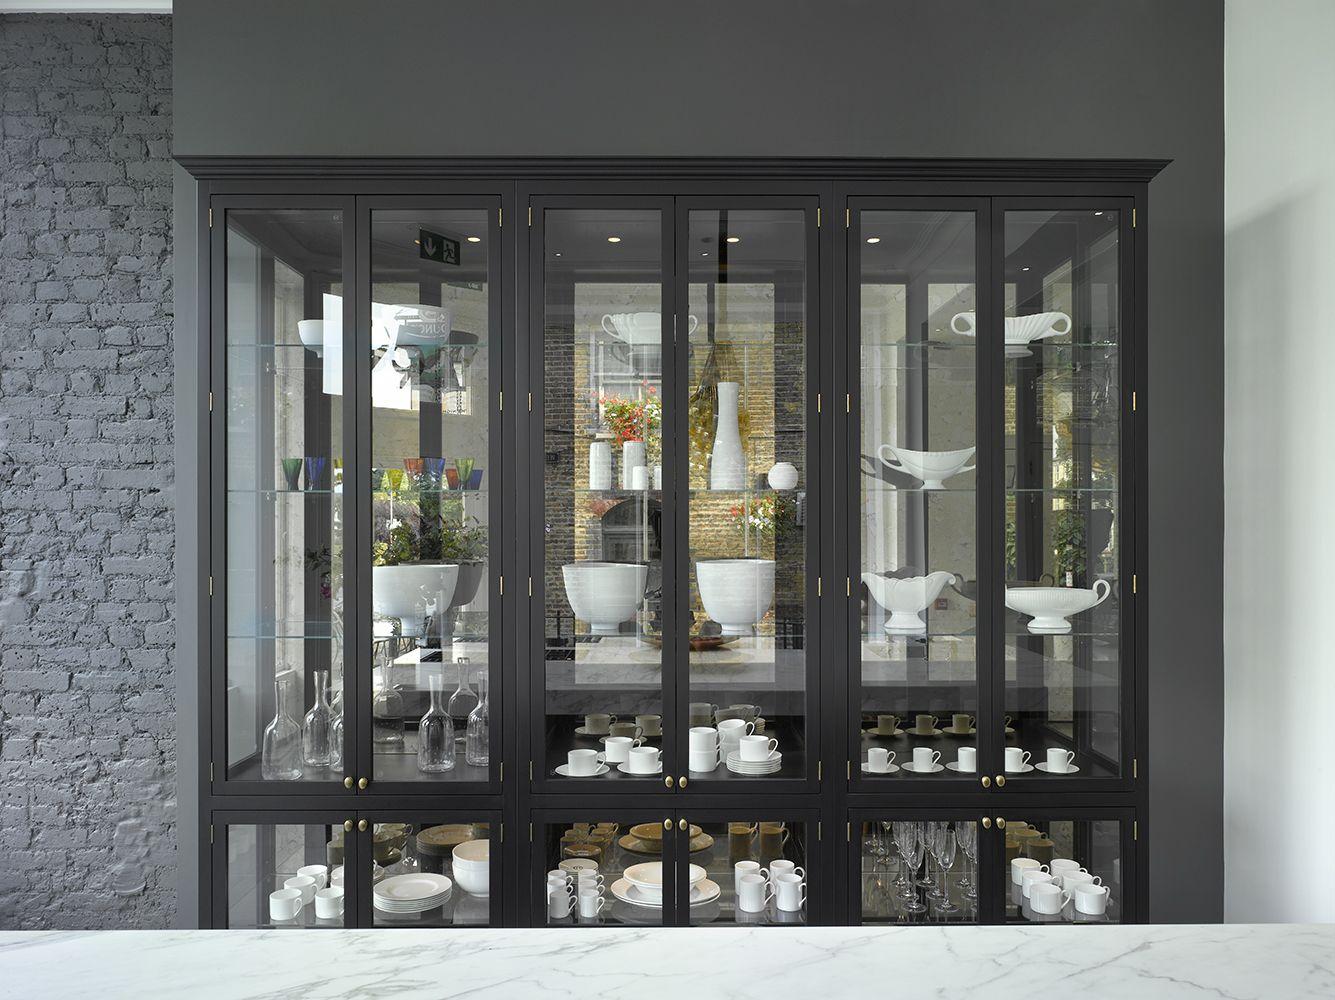 Clapham Shaker Kitchen: The Roundhouse Nightingale Glazed, Matt Lacquer Cabinet Is